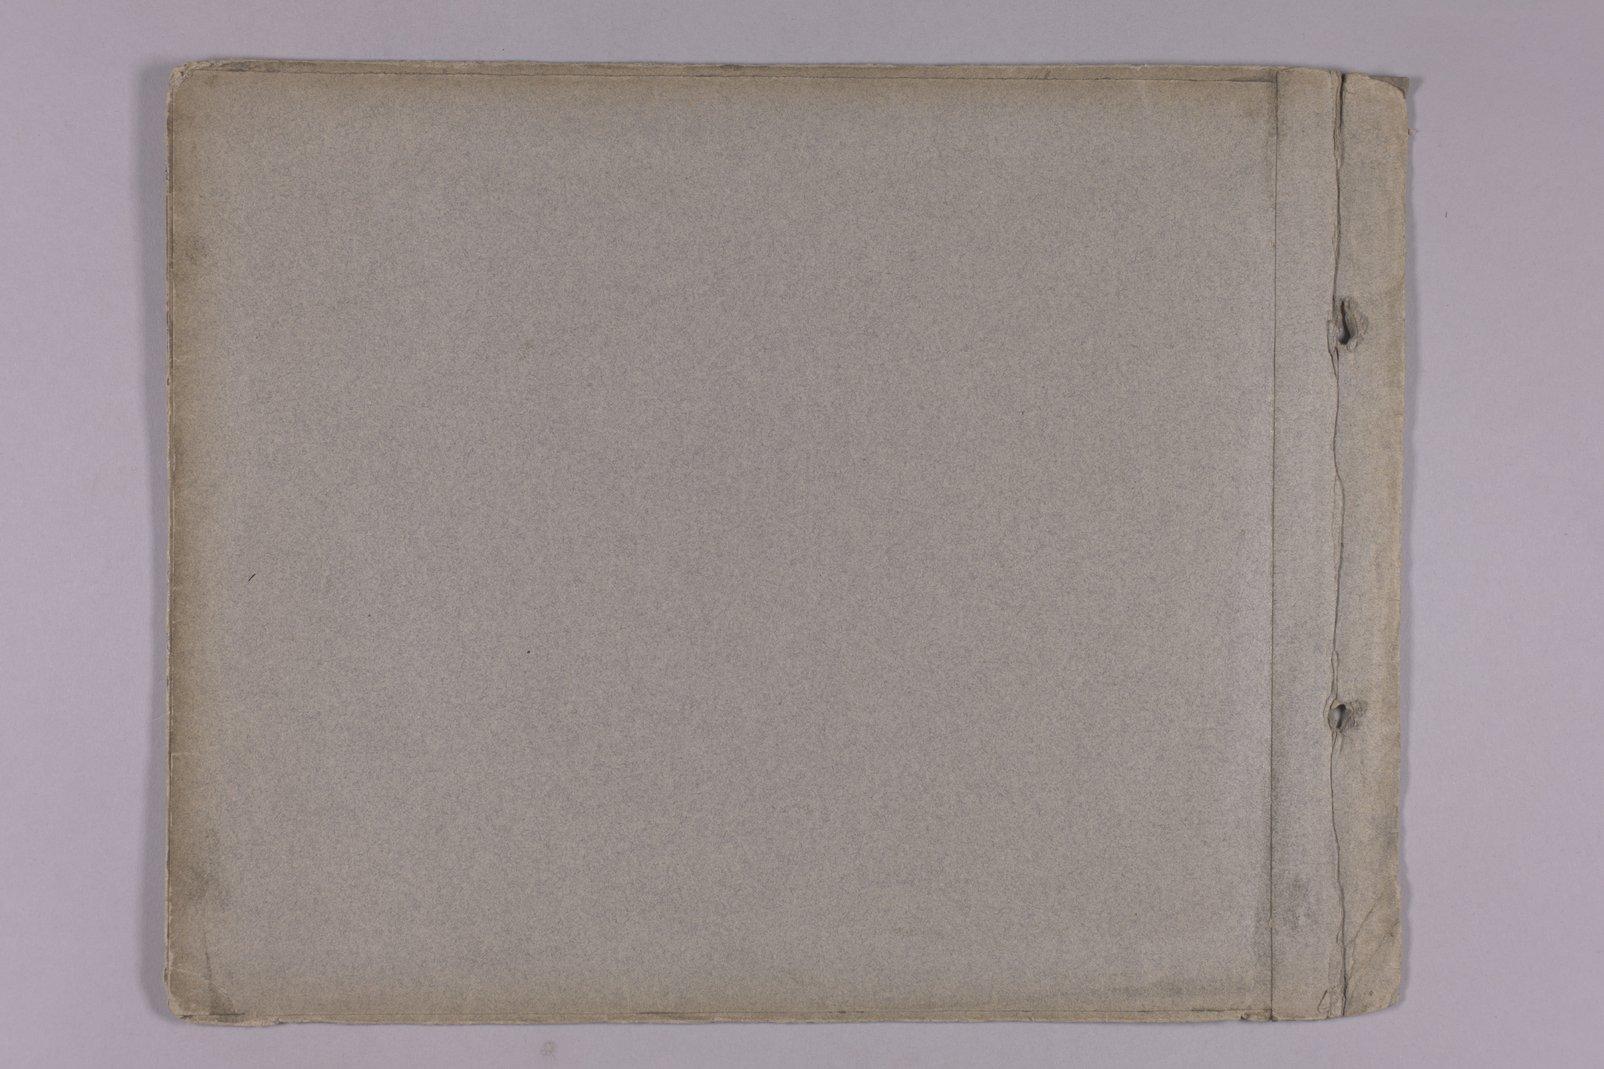 Martha Farnsworth scrapbook #4 - Inside cover